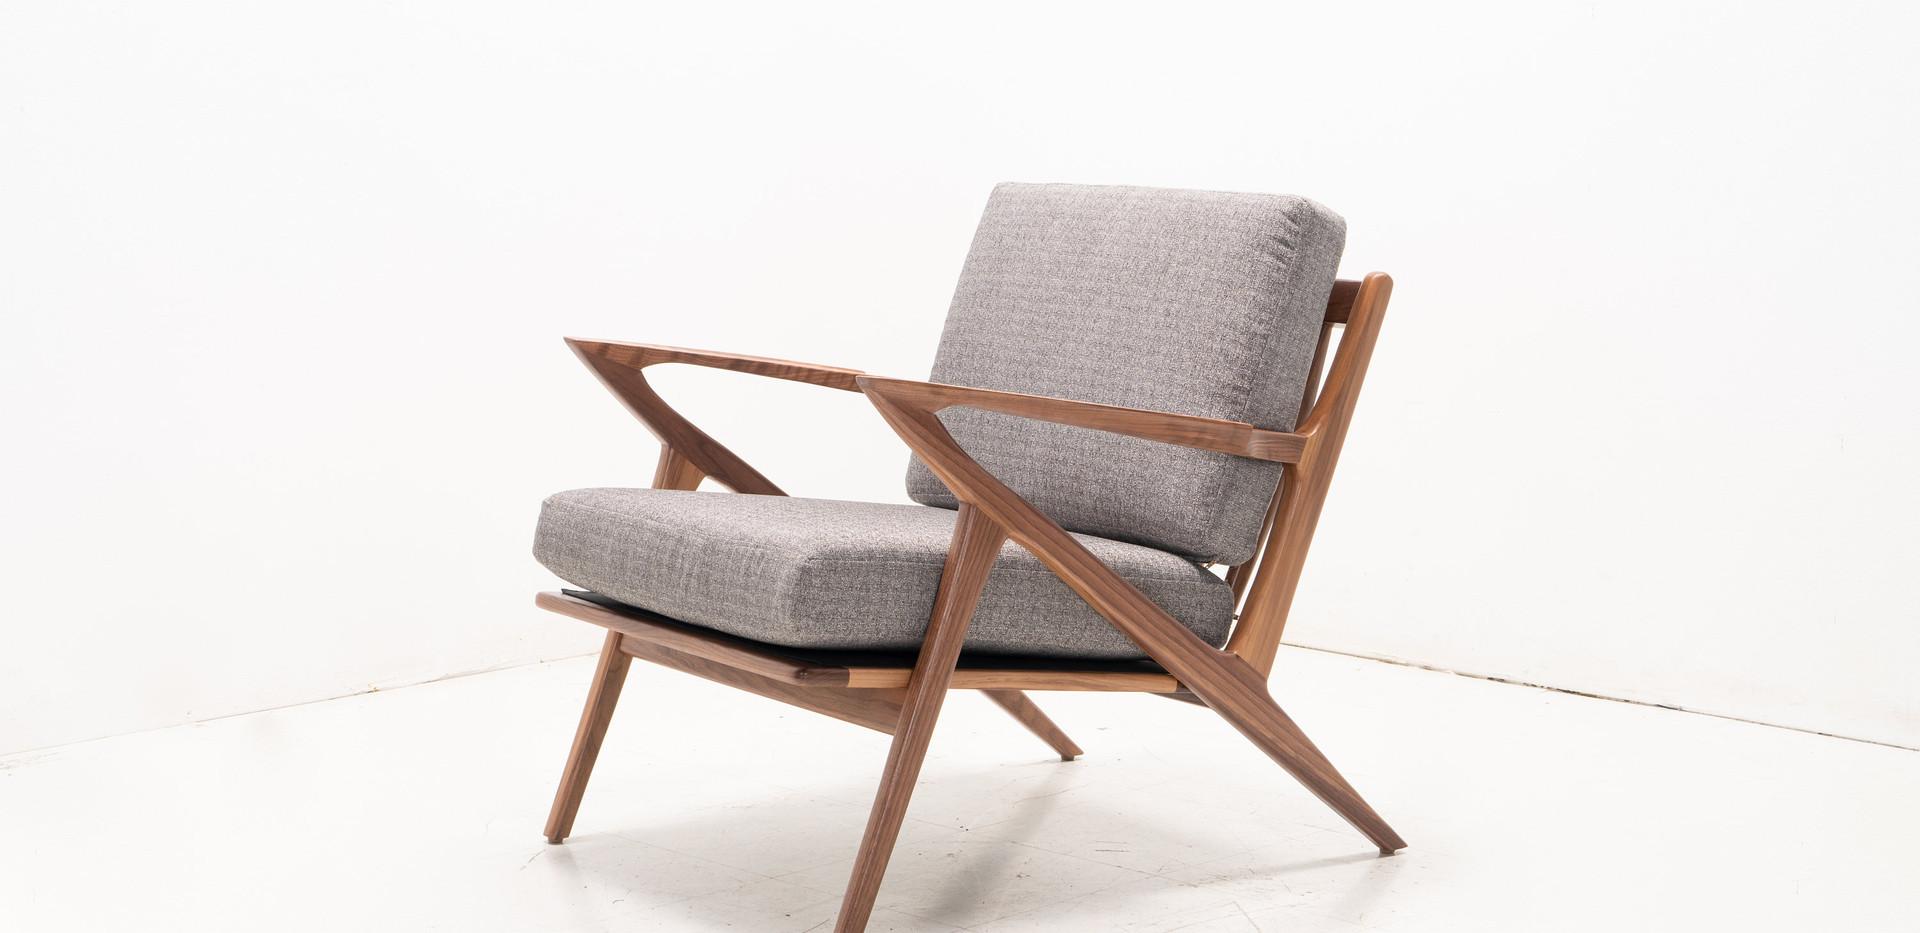 Solvang chair